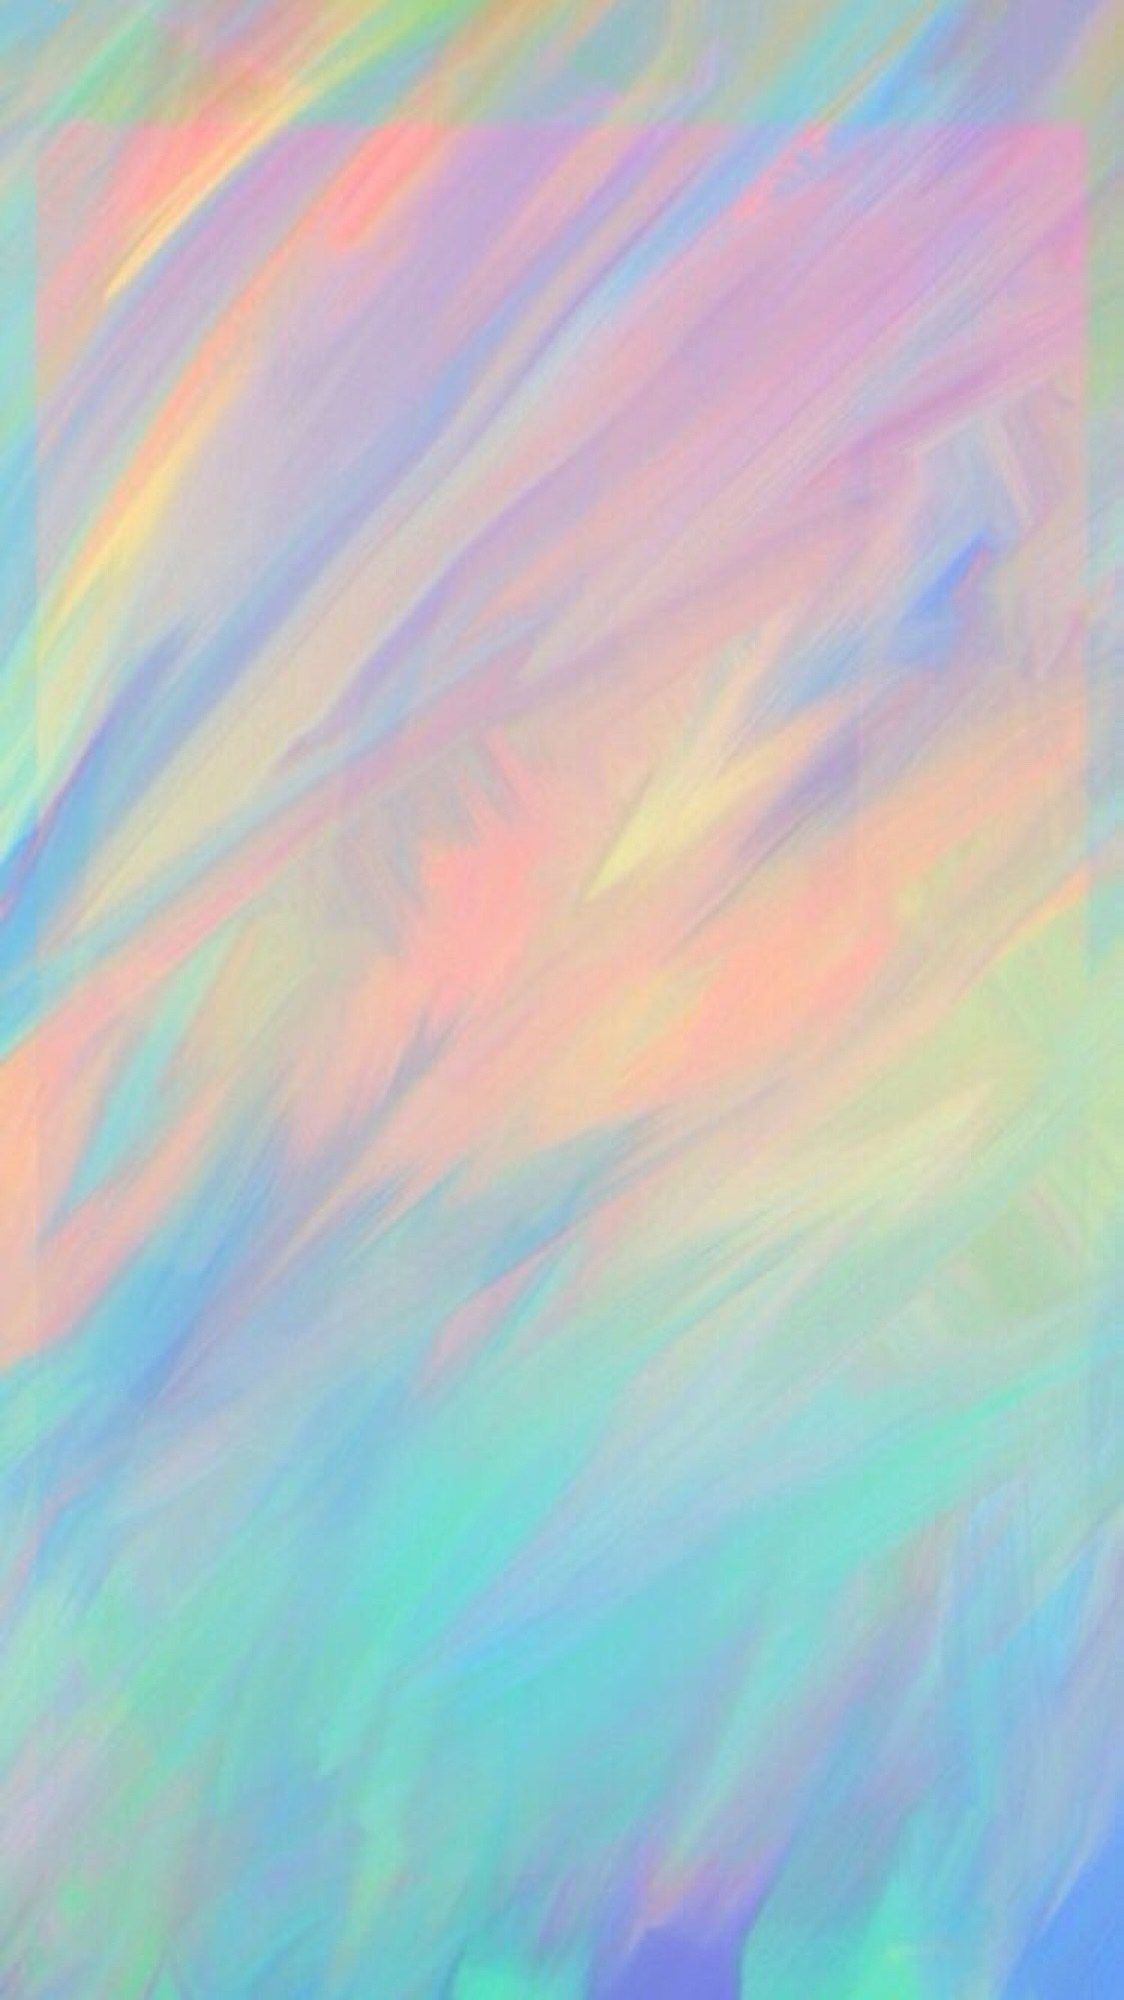 Sky, Blue, Meteorological phenomenon, Pattern, Rainbow in